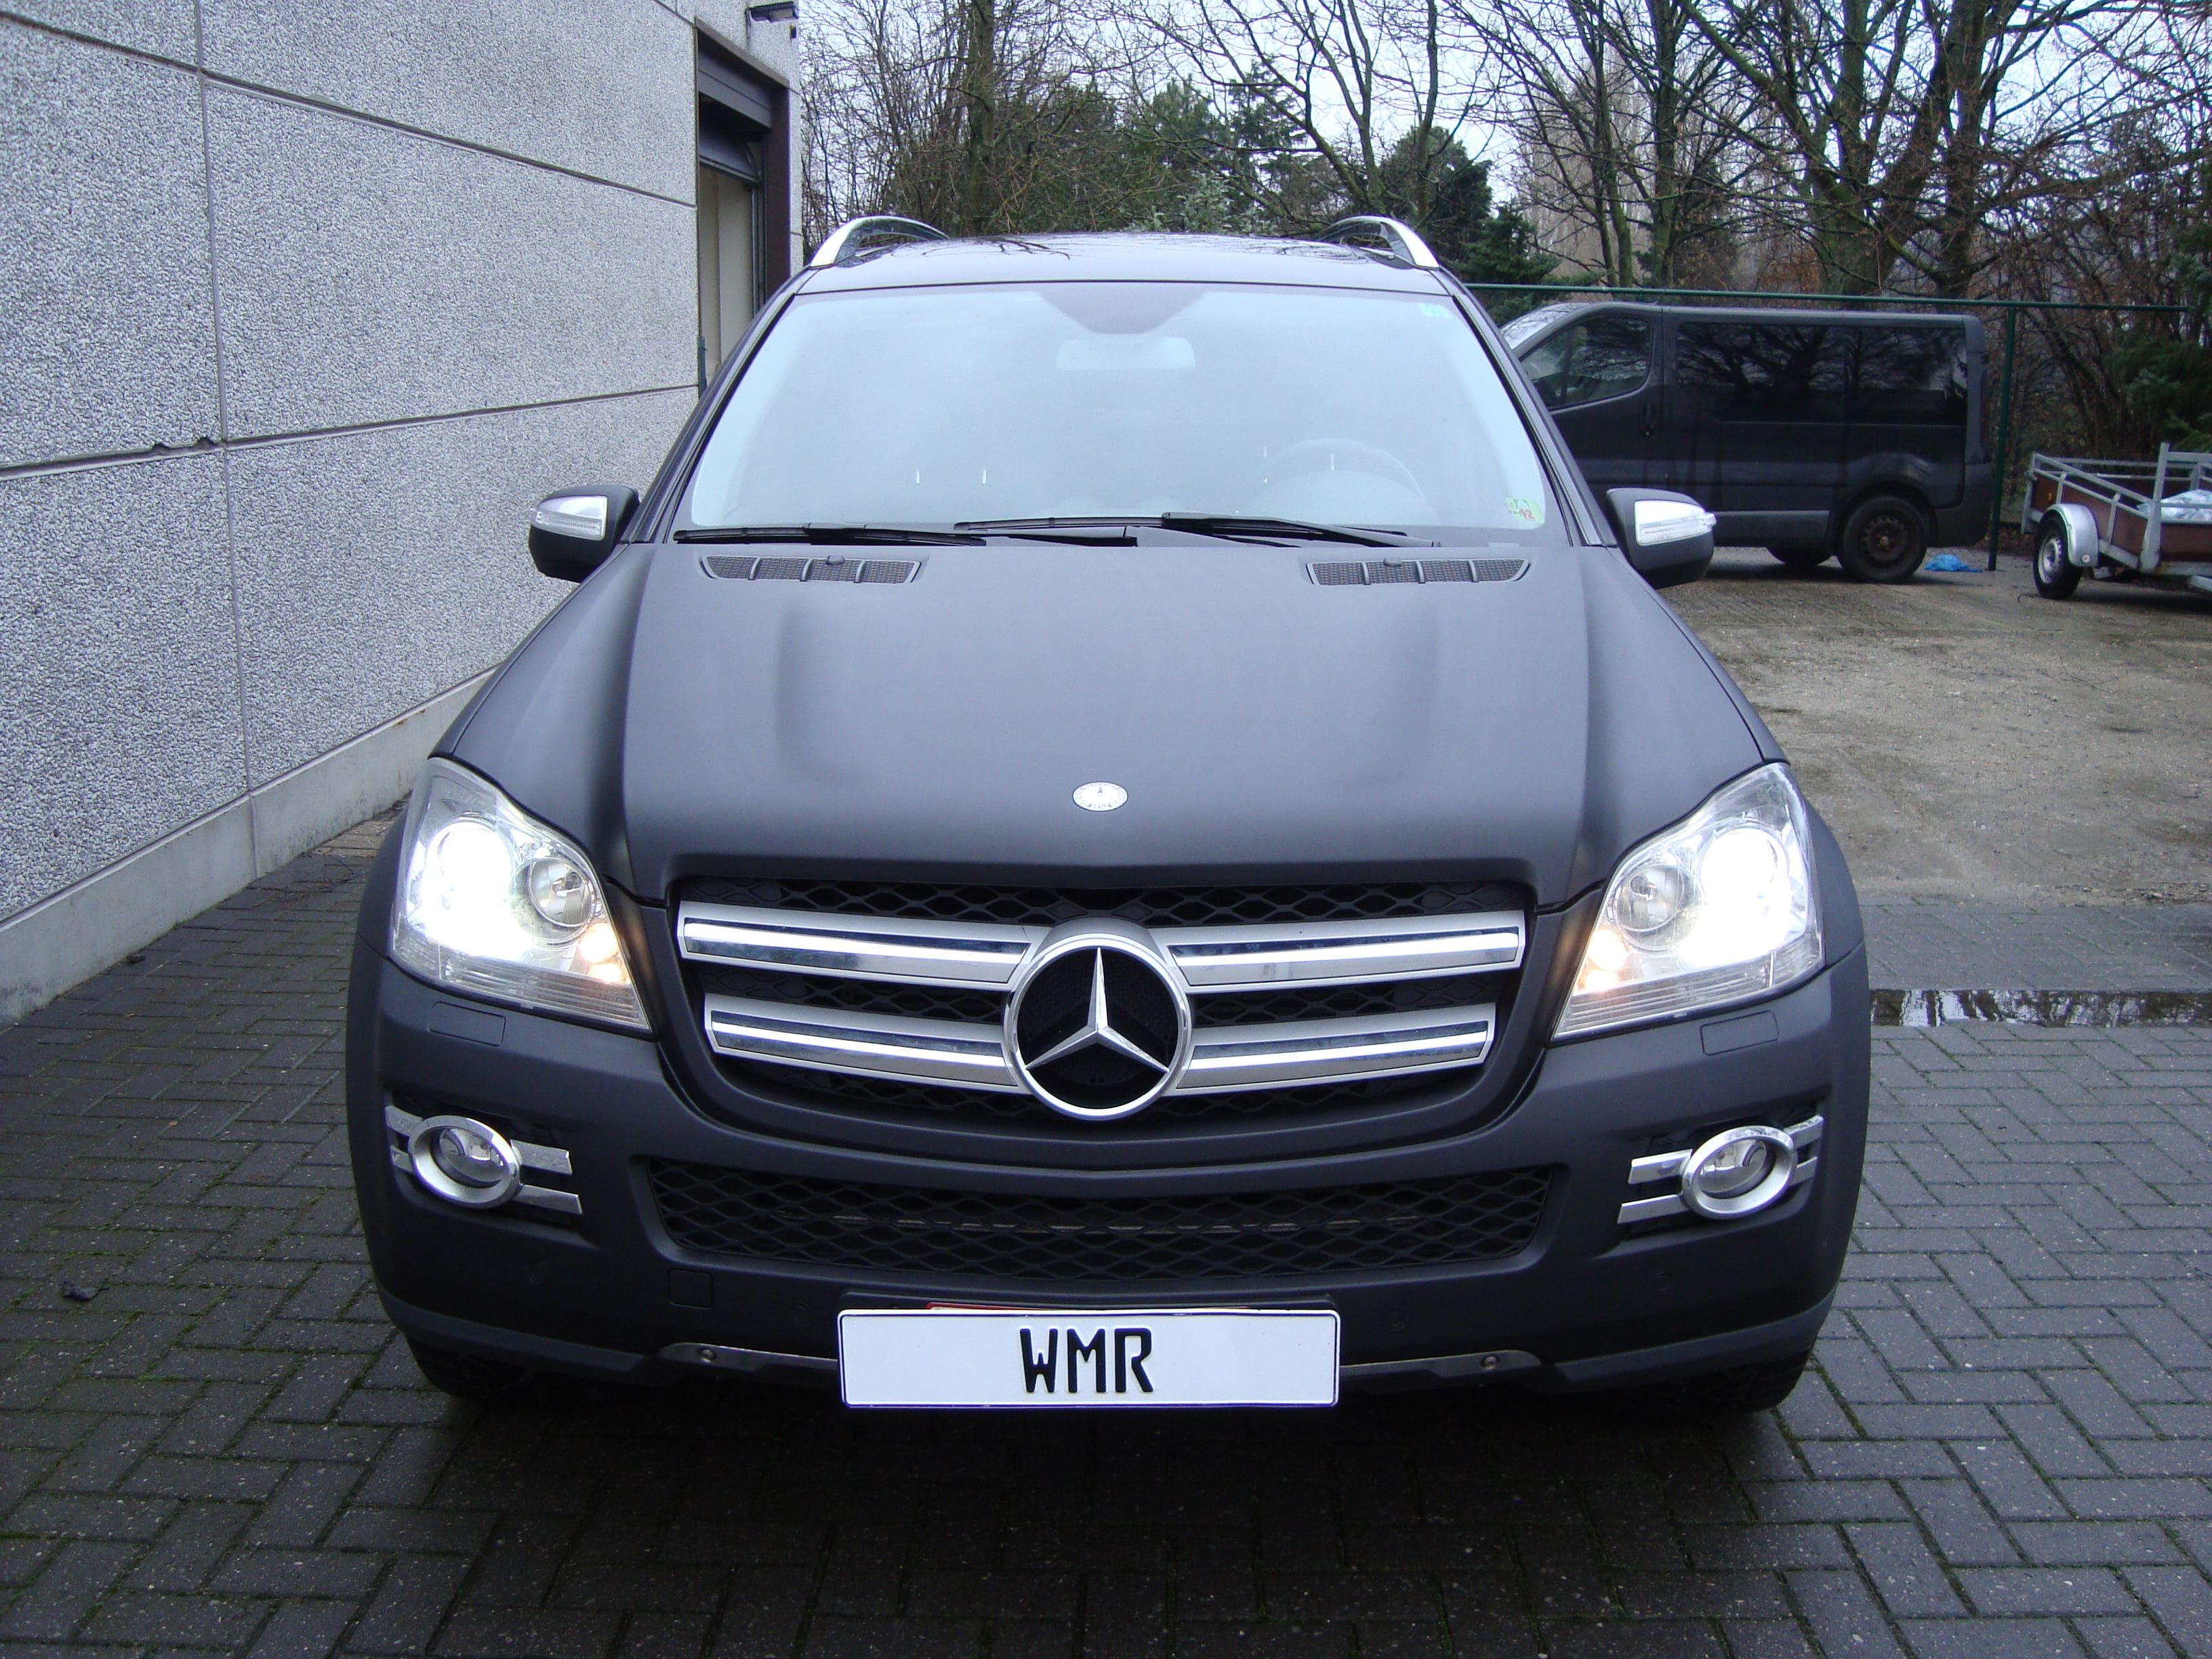 Mercedes GL met Mat Zwarte Wrap, Carwrapping door Wrapmyride.nu Foto-nr:6279, ©2020